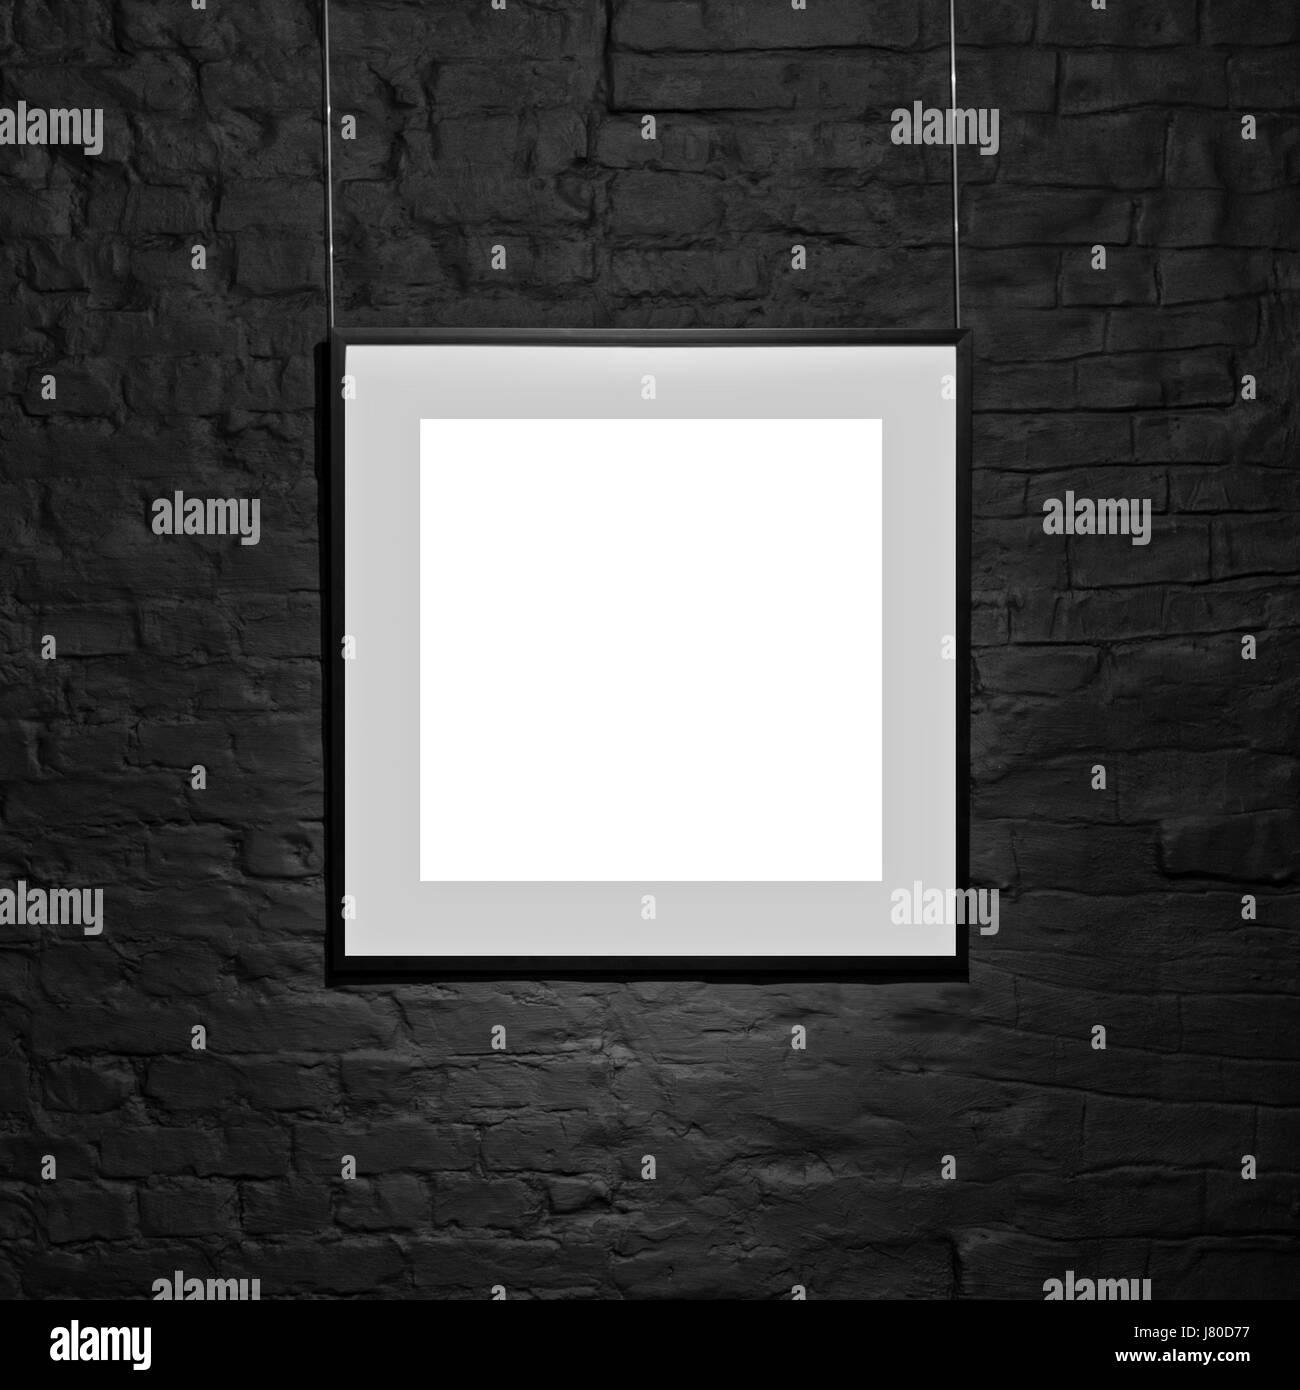 Leeren quadratischen Rahmen auf schwarze Mauer. Leerstelle Poster ...